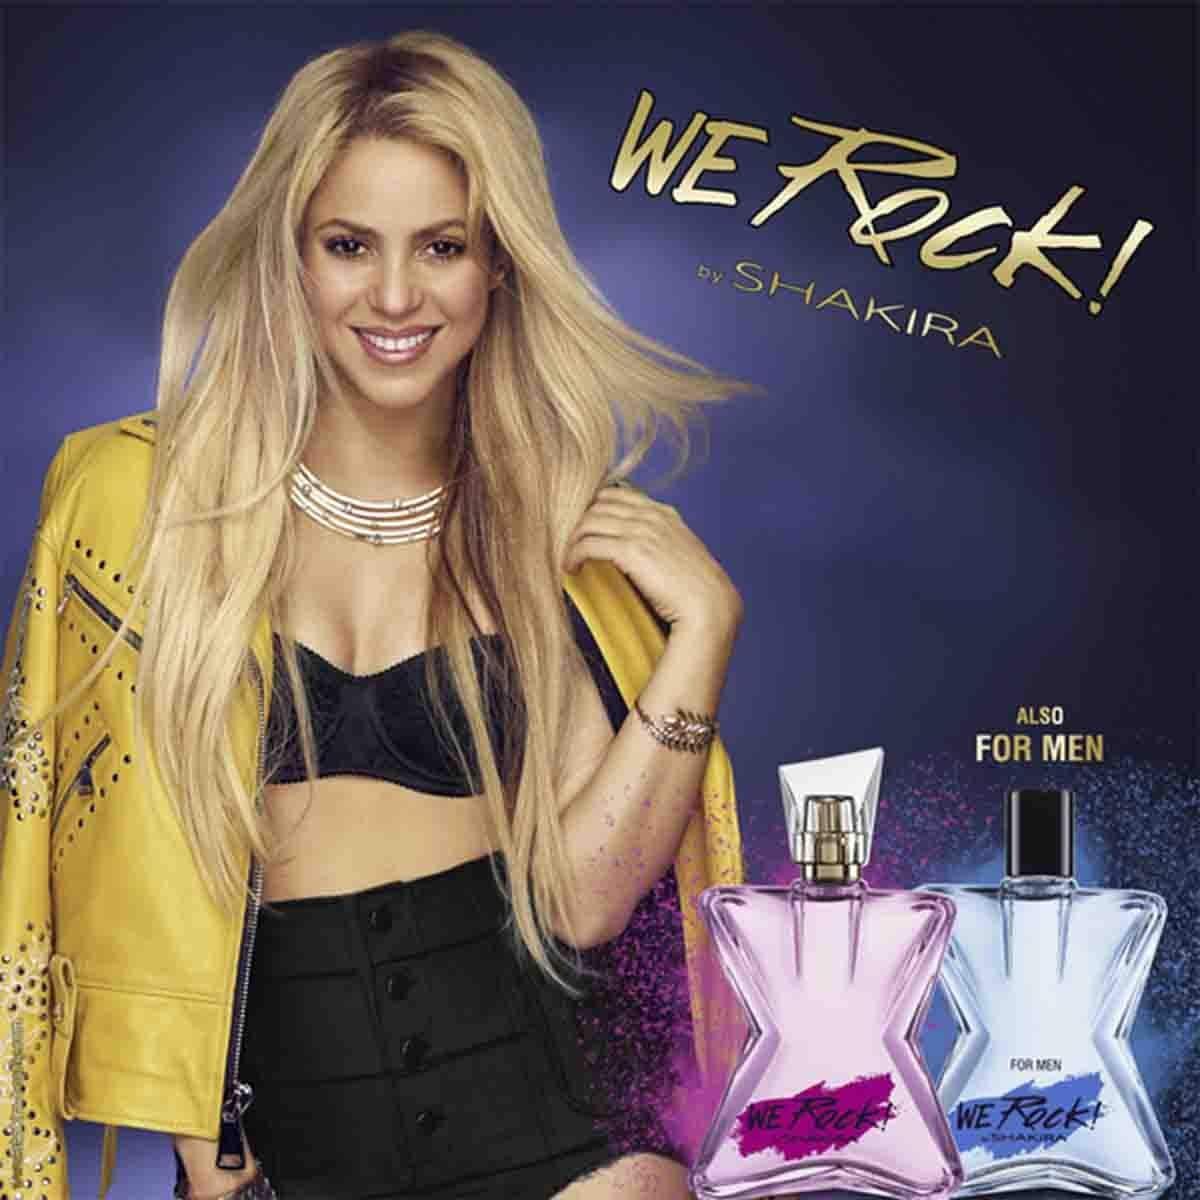 Fragancia para Caballero, Shakira We Rock! For Him Edt 80Ml